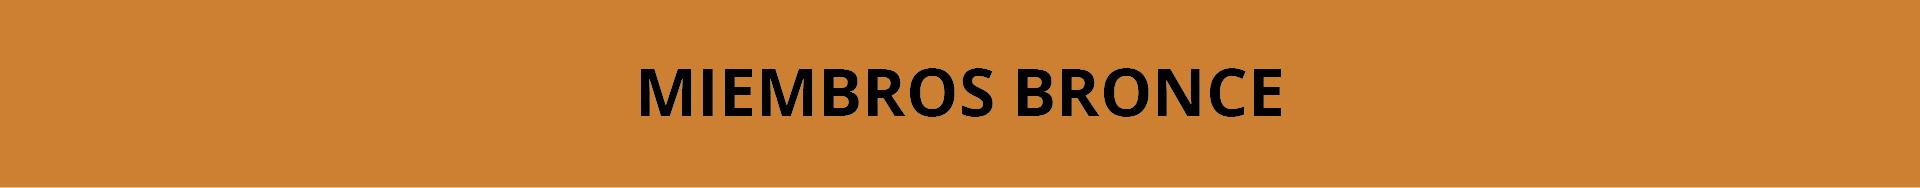 MIEMBROS BRONCE-01